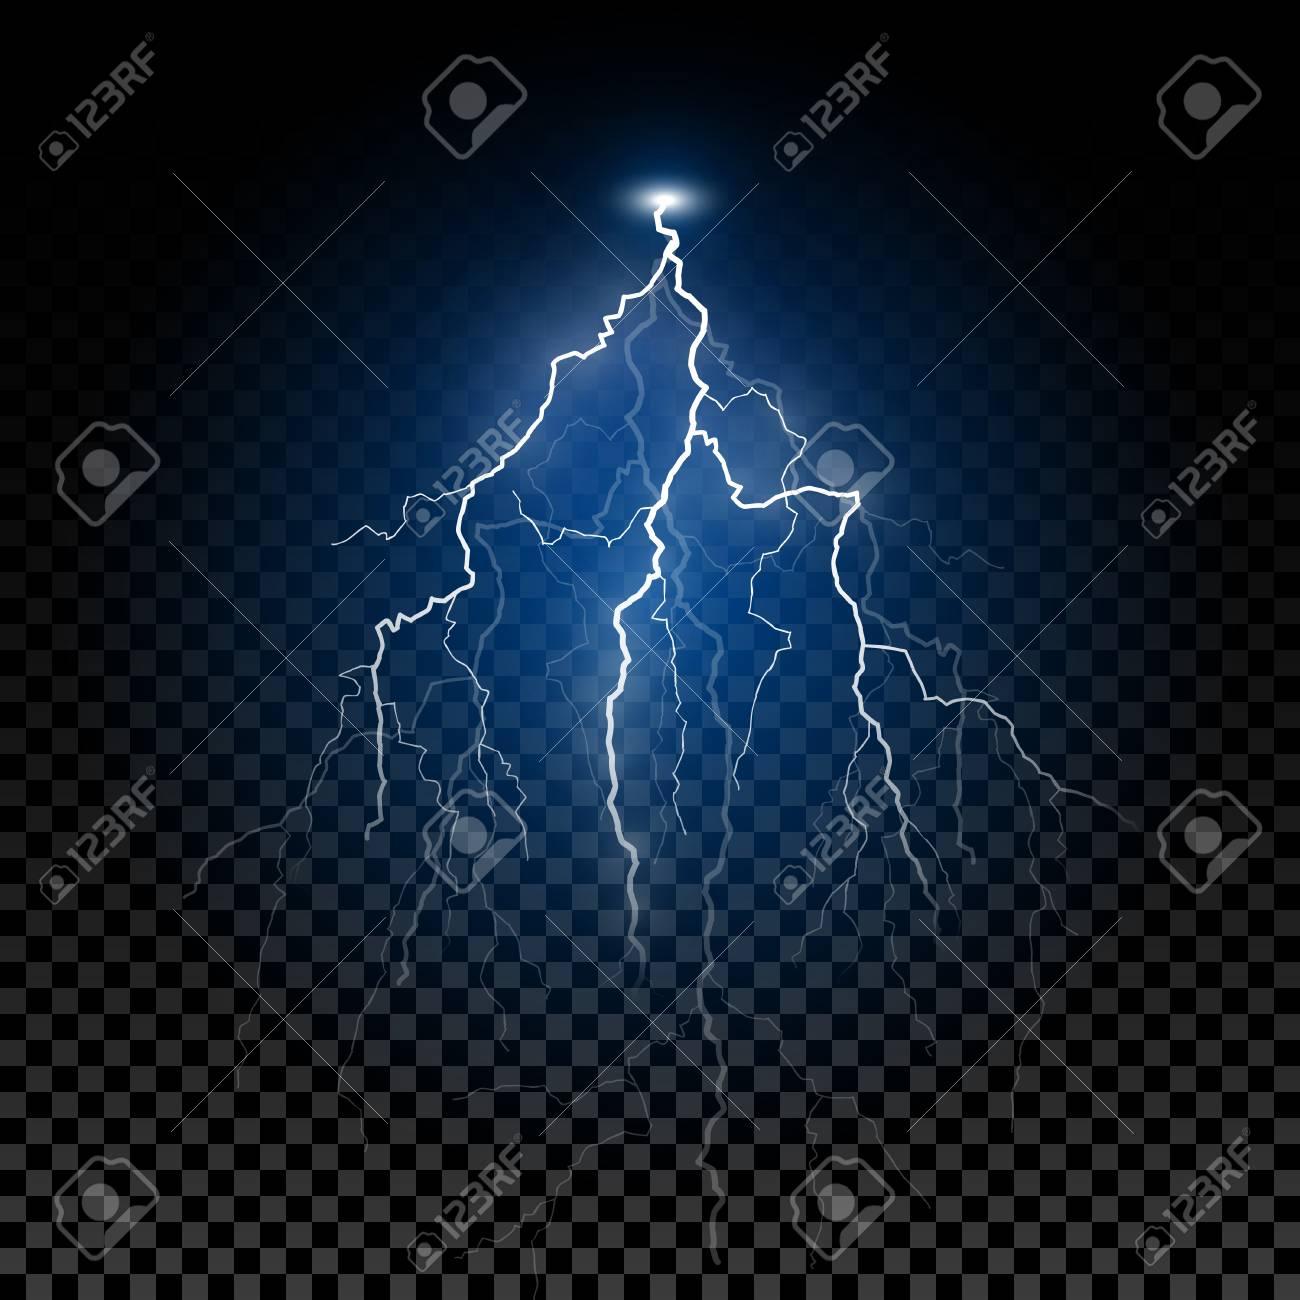 Shiny Realistic Vector Lightning Thunderstorm Flash Lightning Royalty Free Cliparts Vectors And Stock Illustration Image 111636351